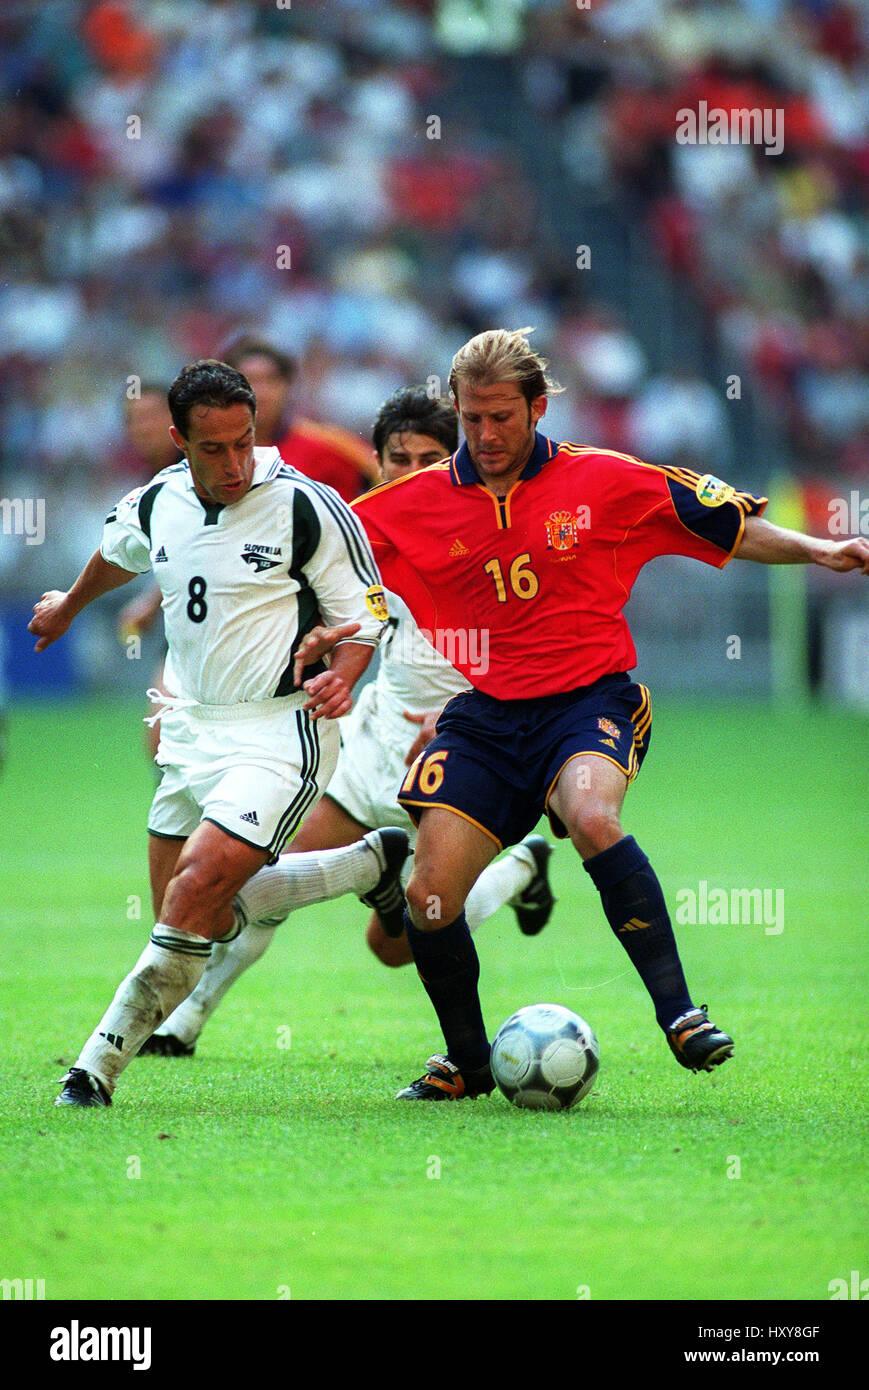 ALES CEH & GAIZKA MENDIETA SLOVENIA V SPAIN CHARLEROI EURO 2000 20